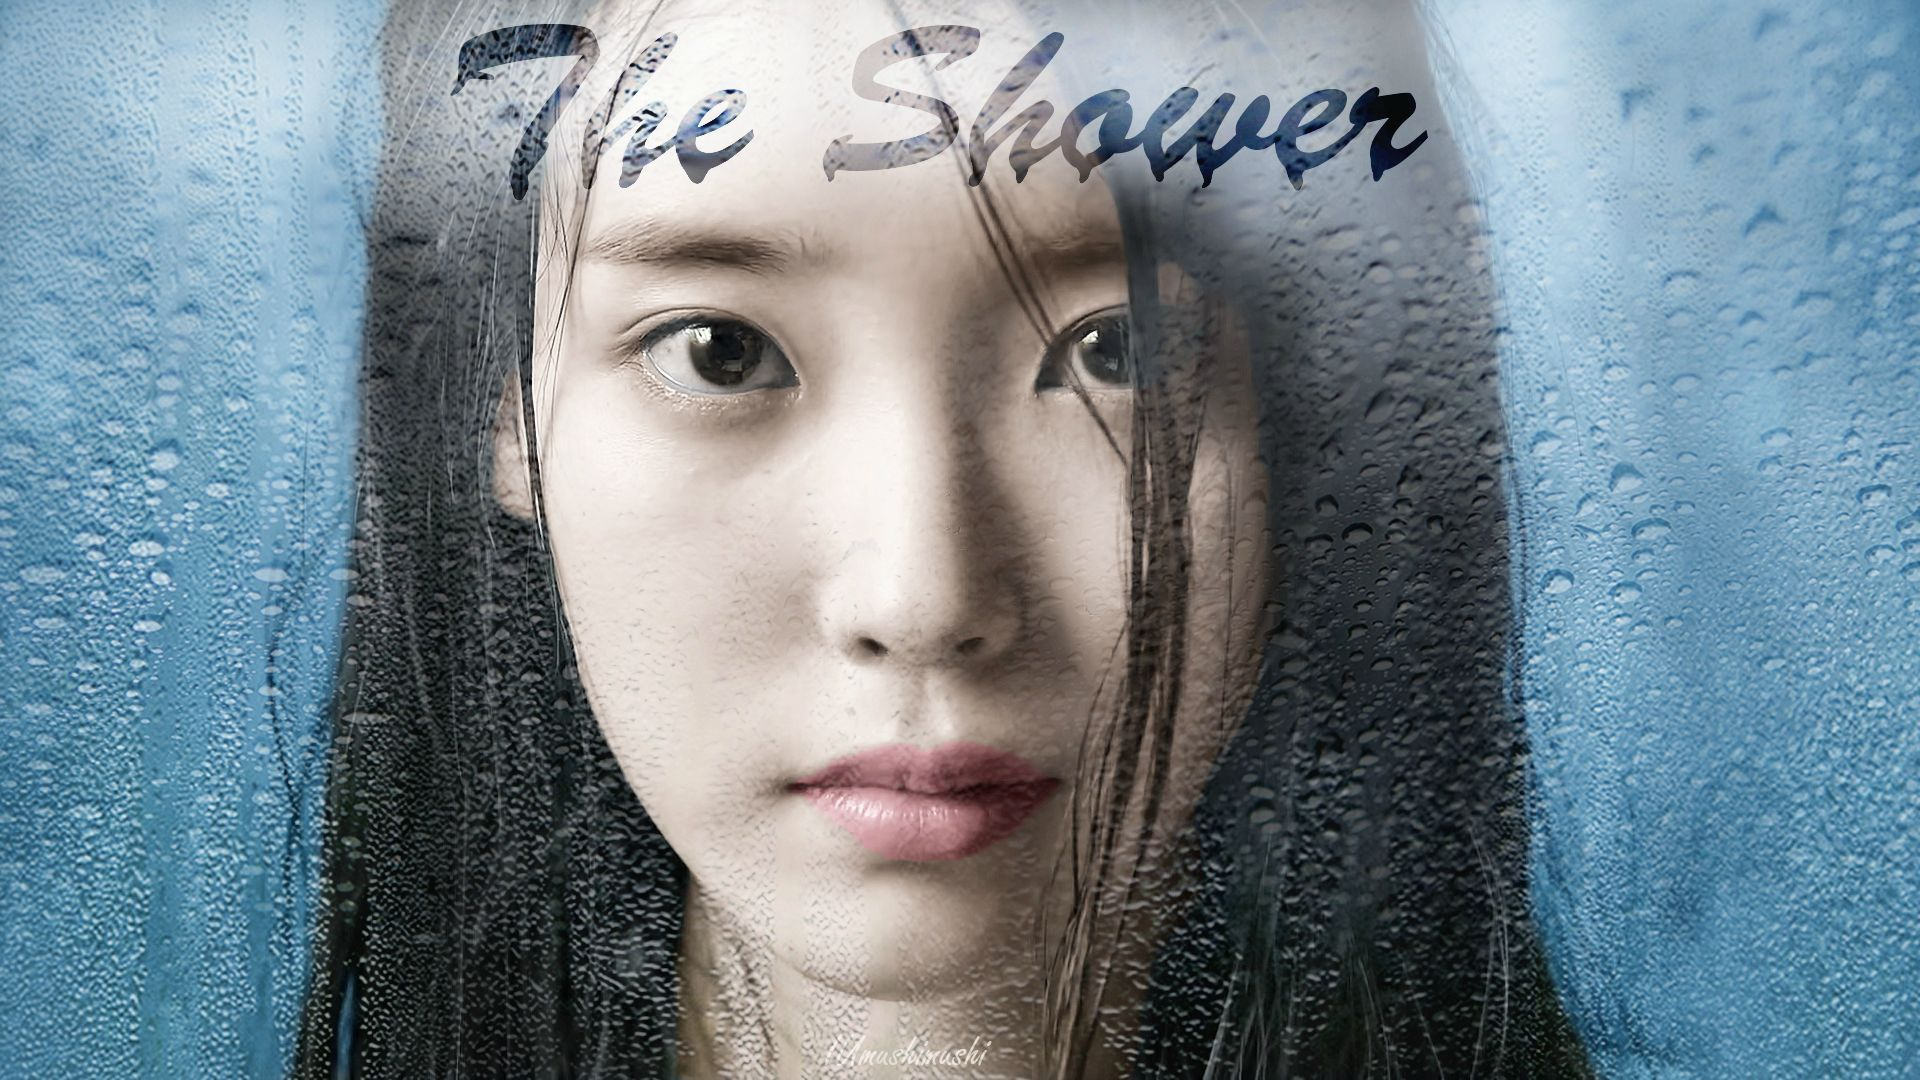 [Teaser 1] IU(아이유) _ The shower(푸르던) Wallpaper 1920x1080 (Ver.2)